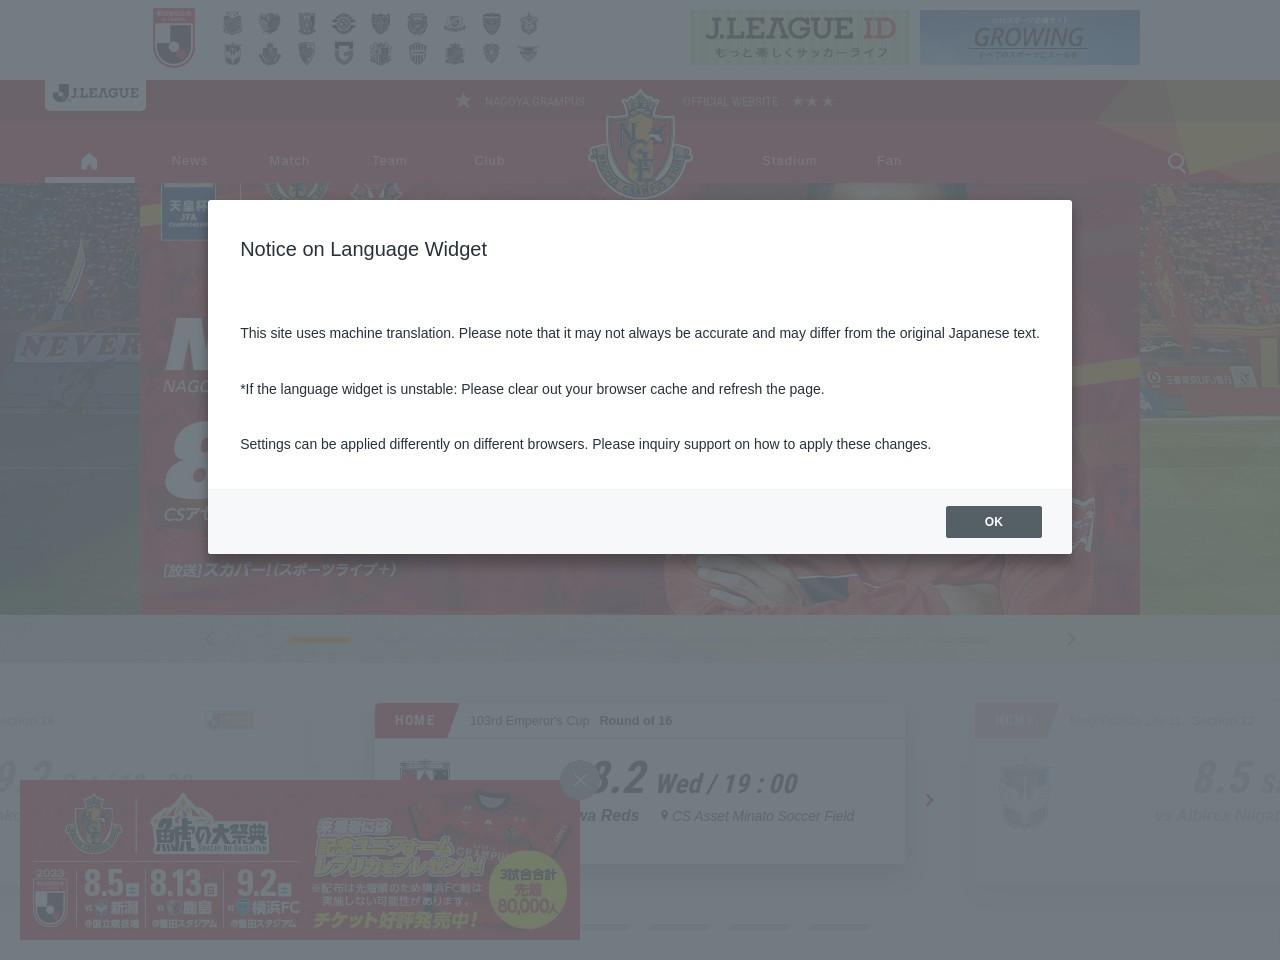 http://nagoya-grampus.jp/news/pressrelease/2018/10052018-28-vs.php